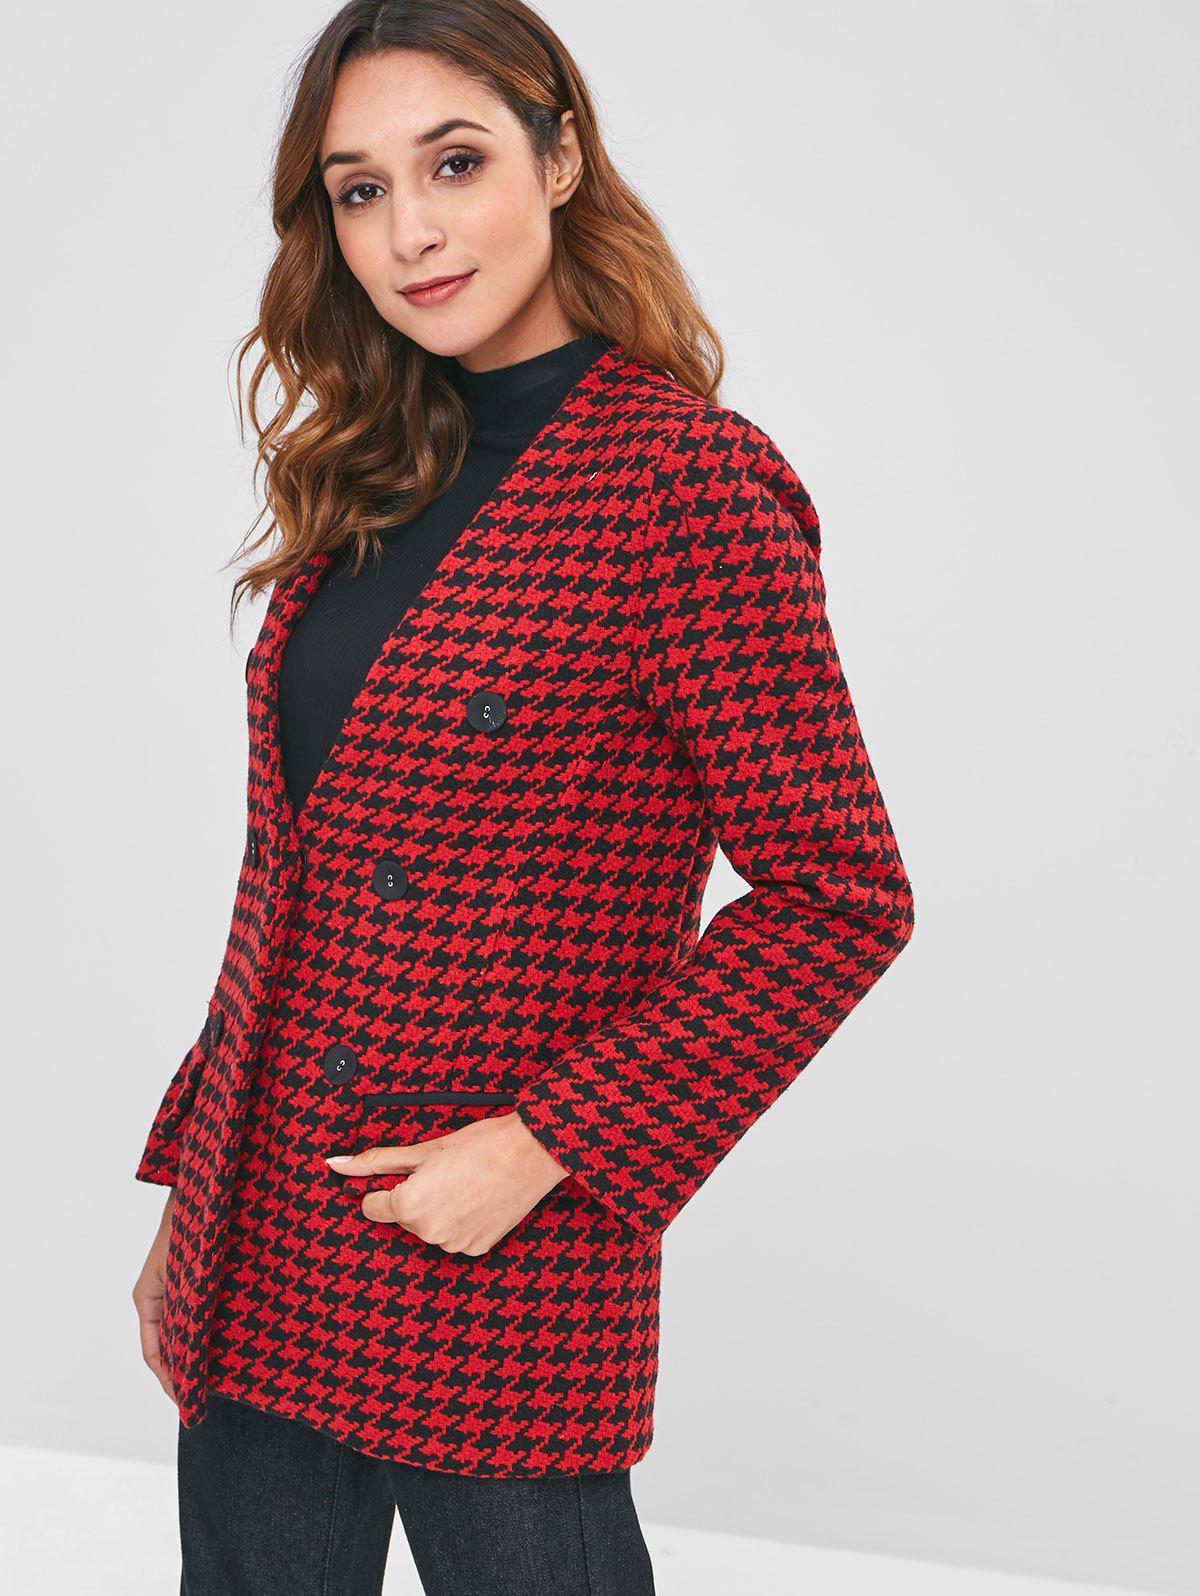 Flap Pockets Houndstooth Tweed Coat